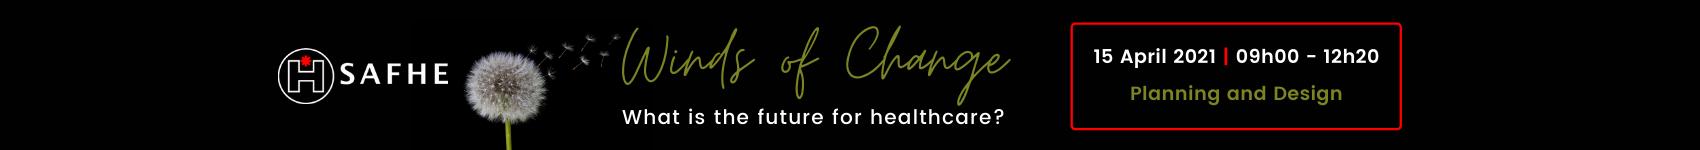 SAFHE Event Page Banner - 15 April 2021